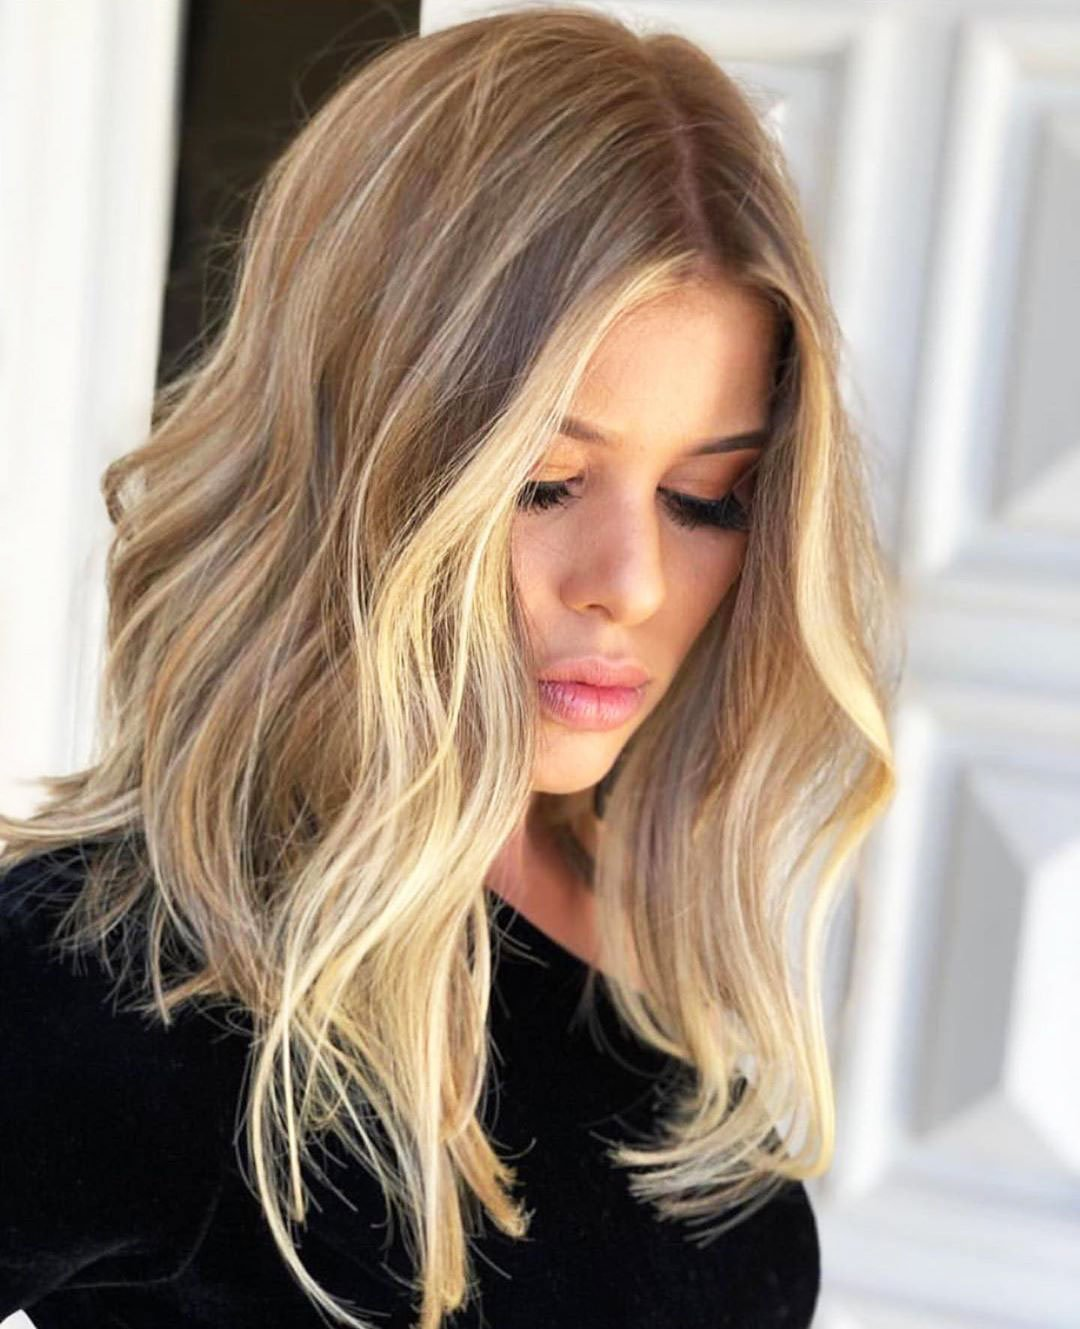 hair styles for short hair (11)